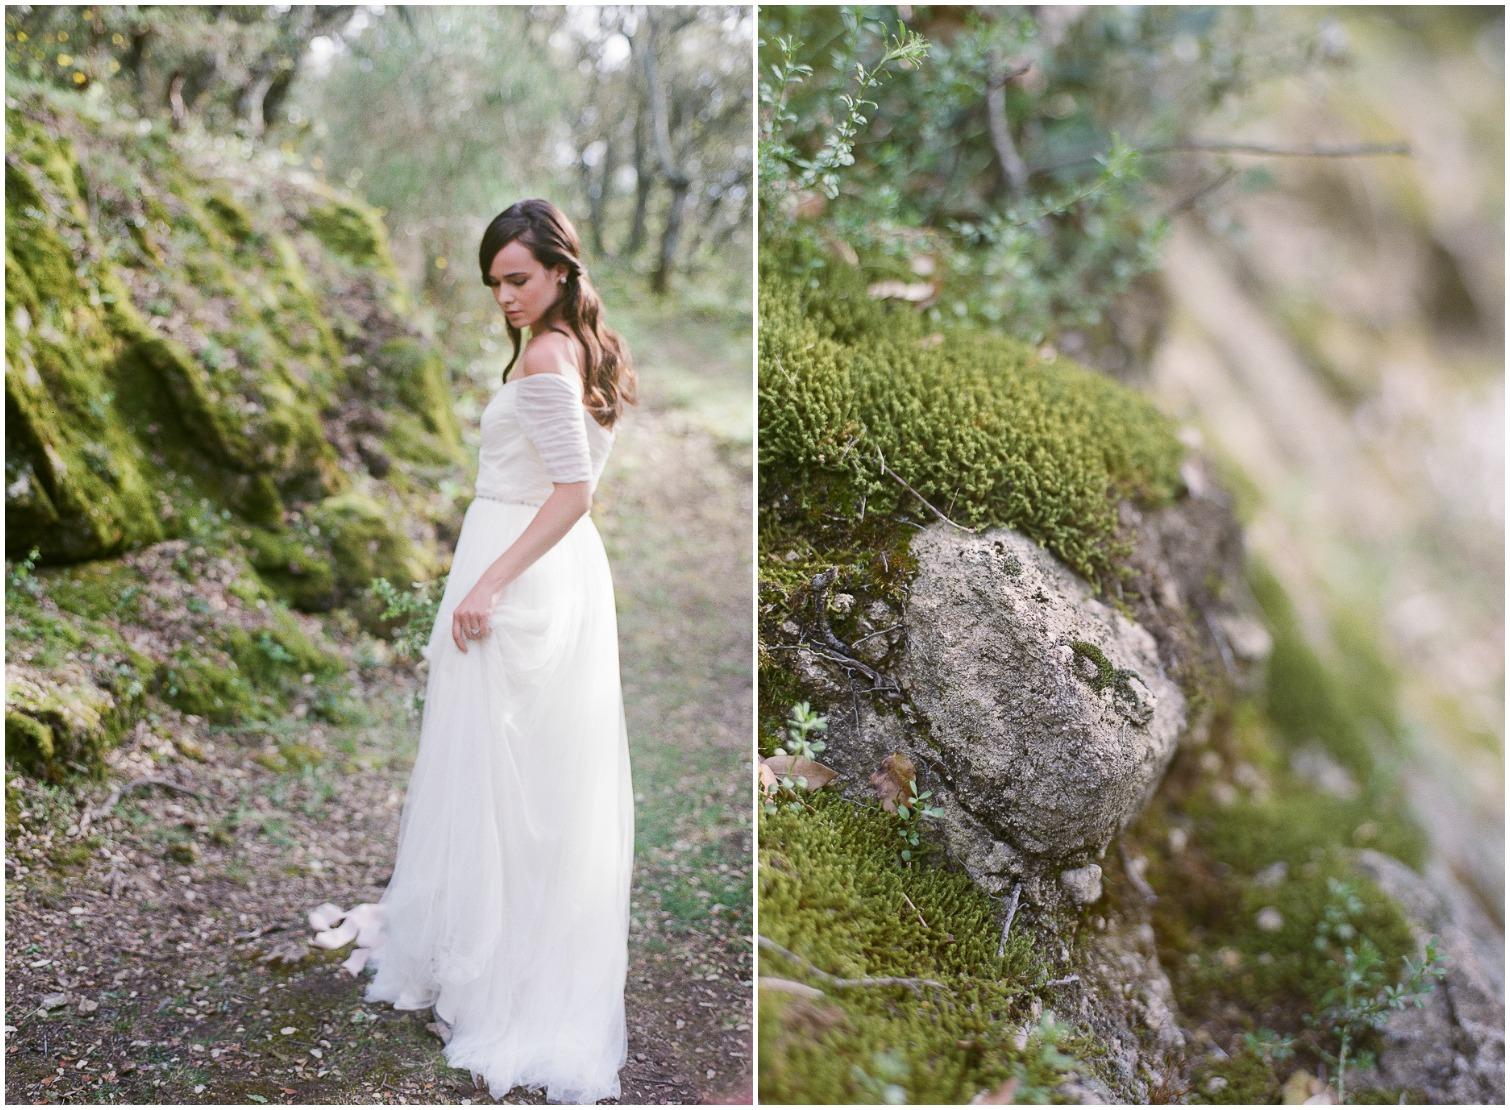 Romantic Bride in the woods ©Celine Chhuon